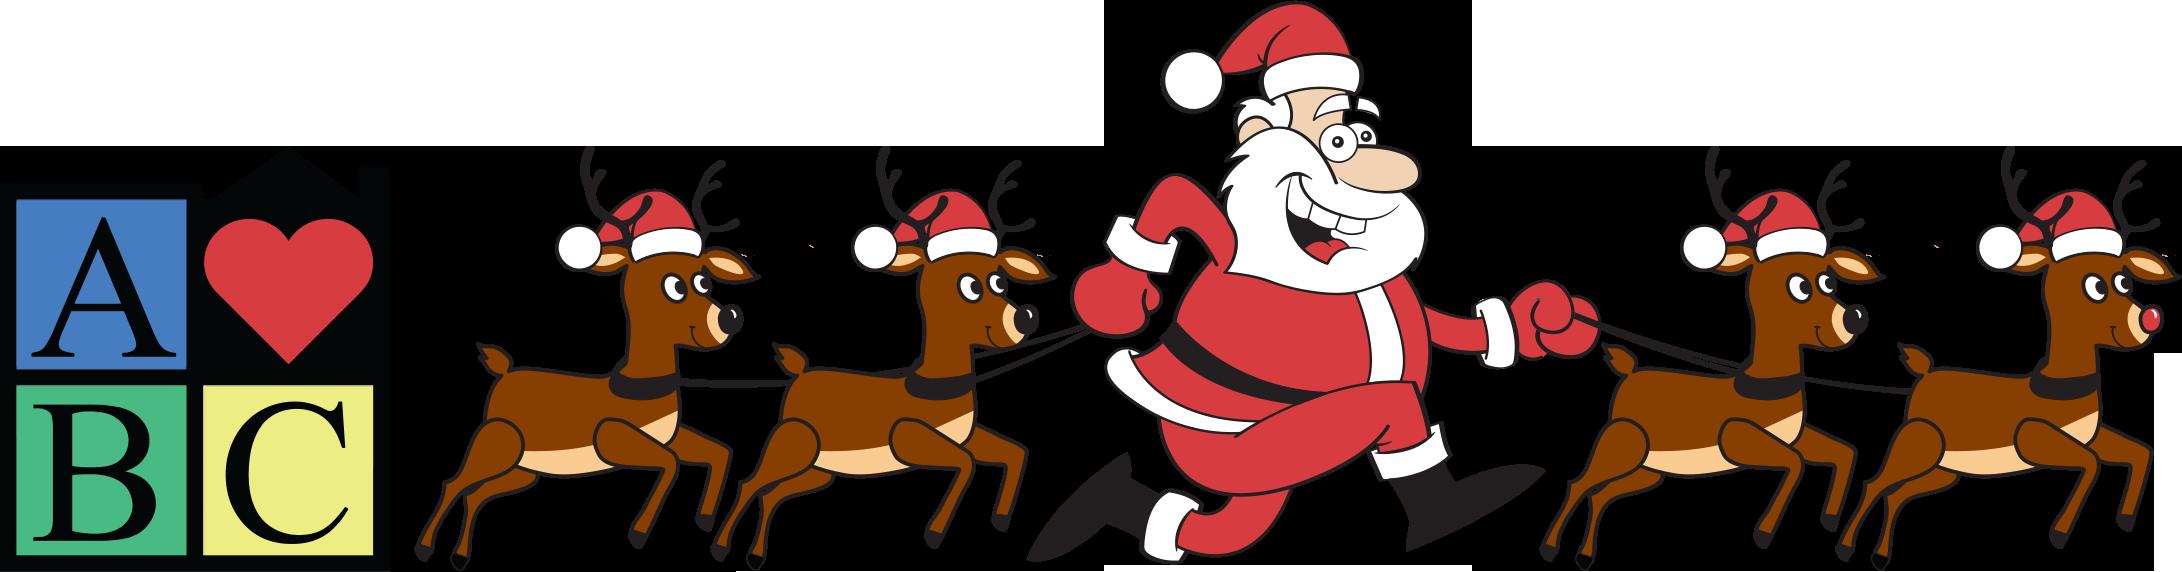 081919 ABC House Runaway Santa  Run_logo copy.png